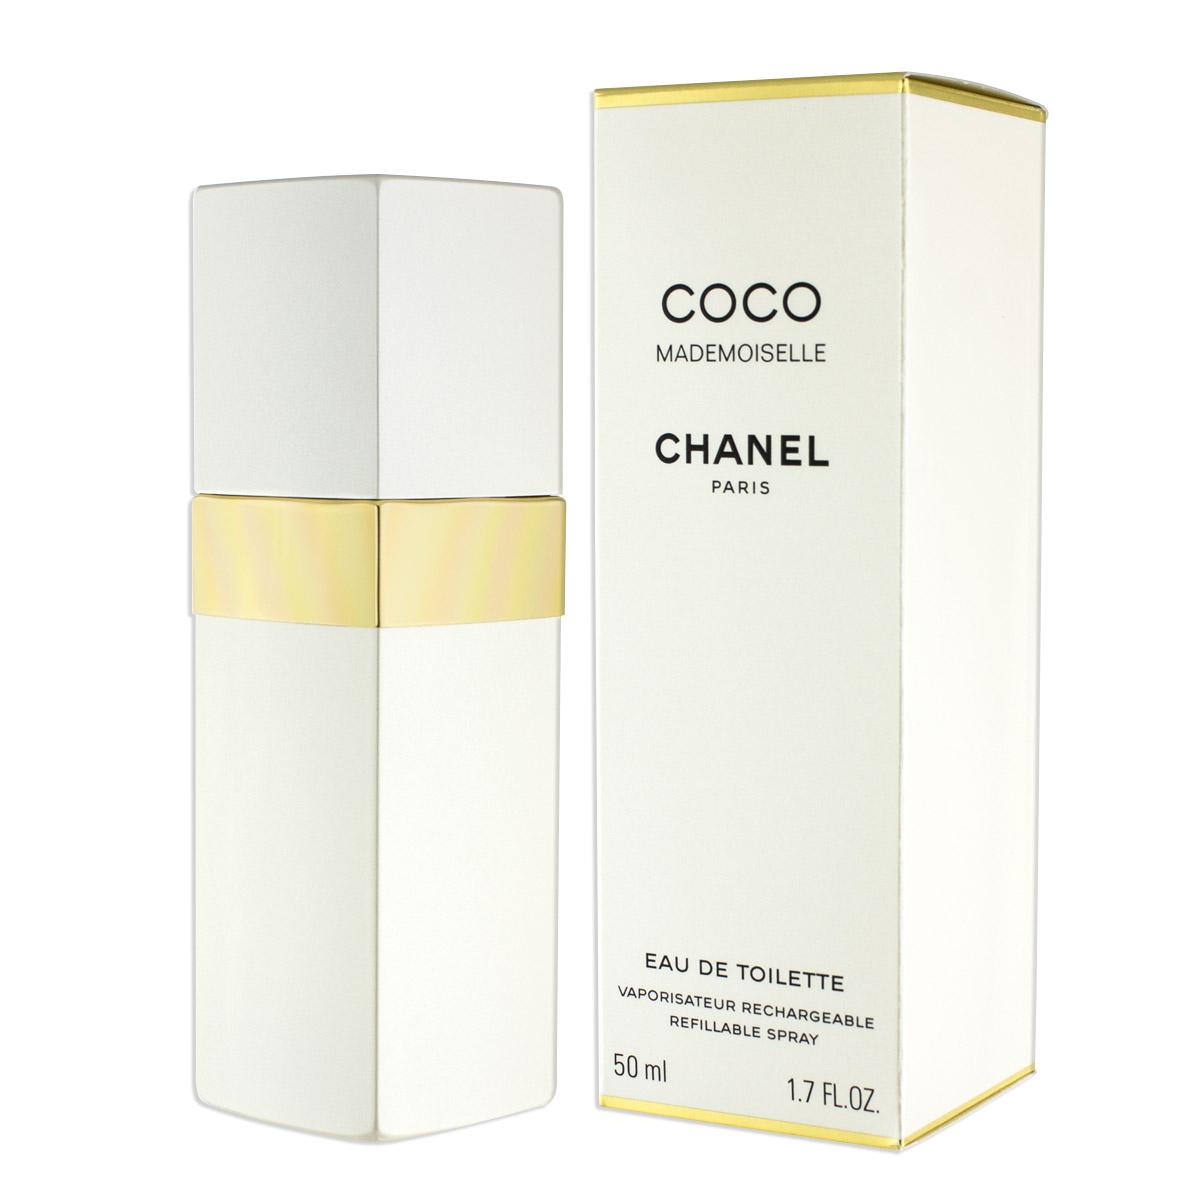 Chanel Coco Mademoiselle EDT plnitelný 50 ml W